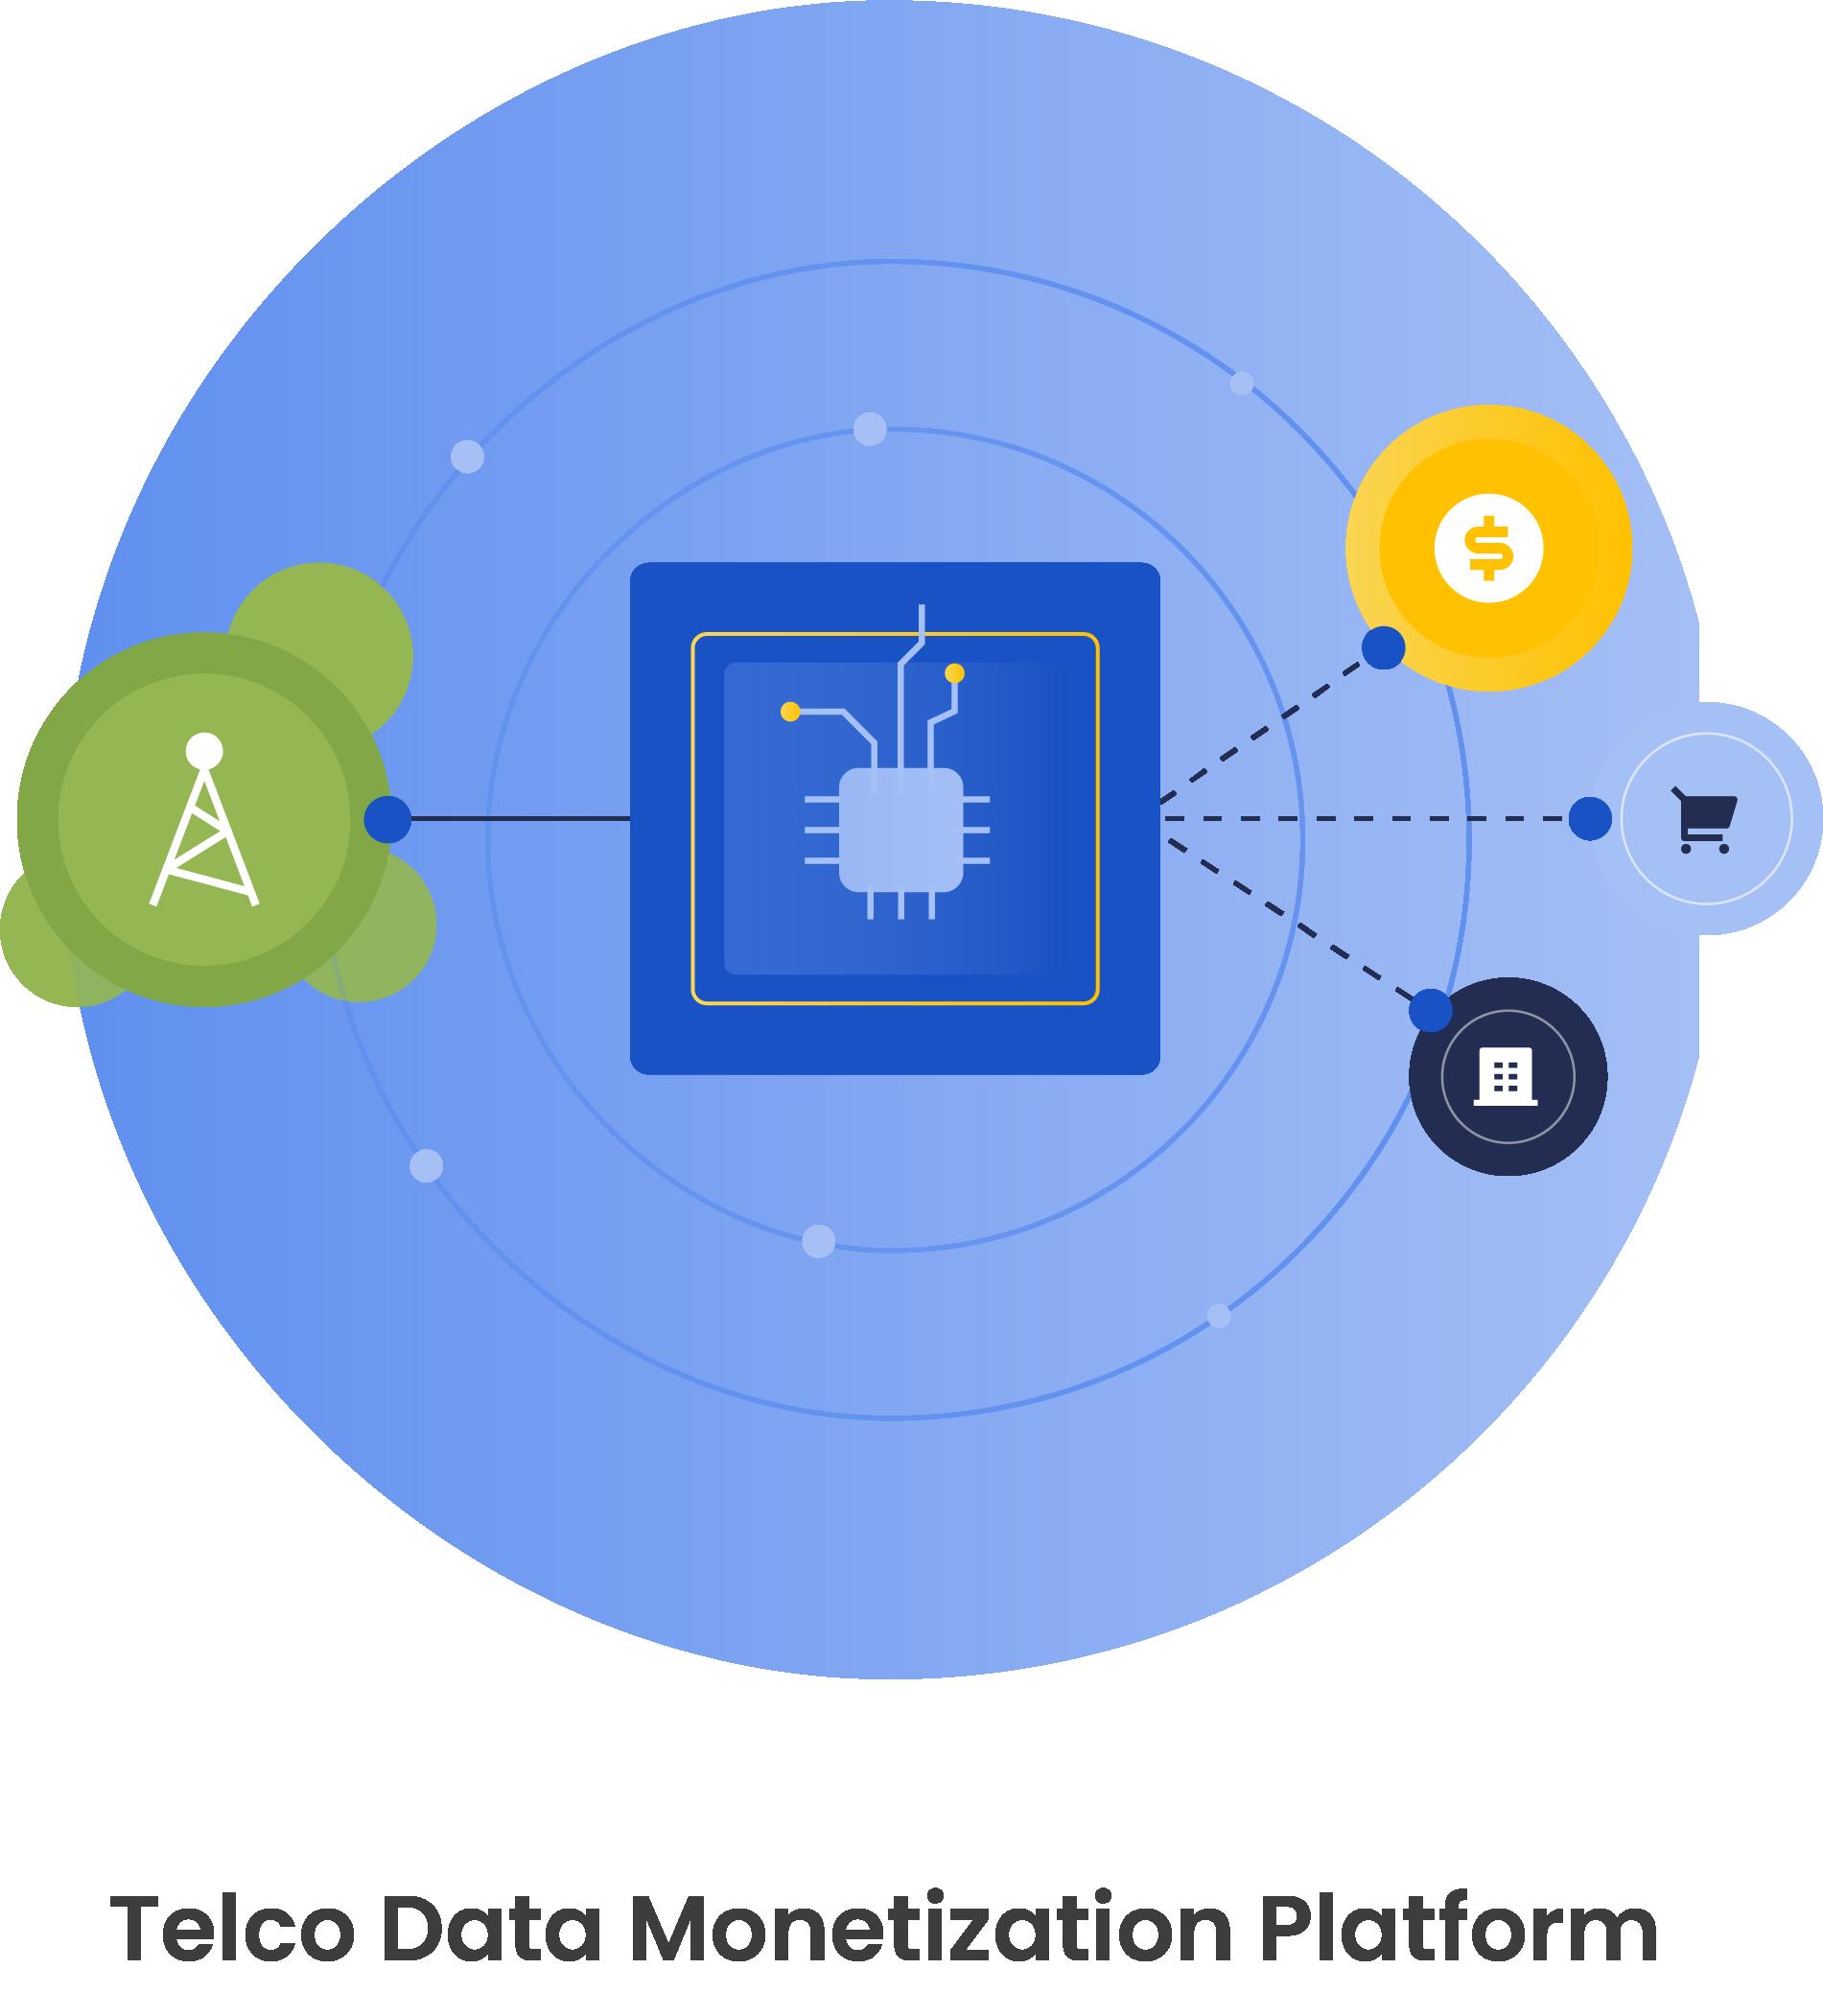 Telco Data Monetization Platform